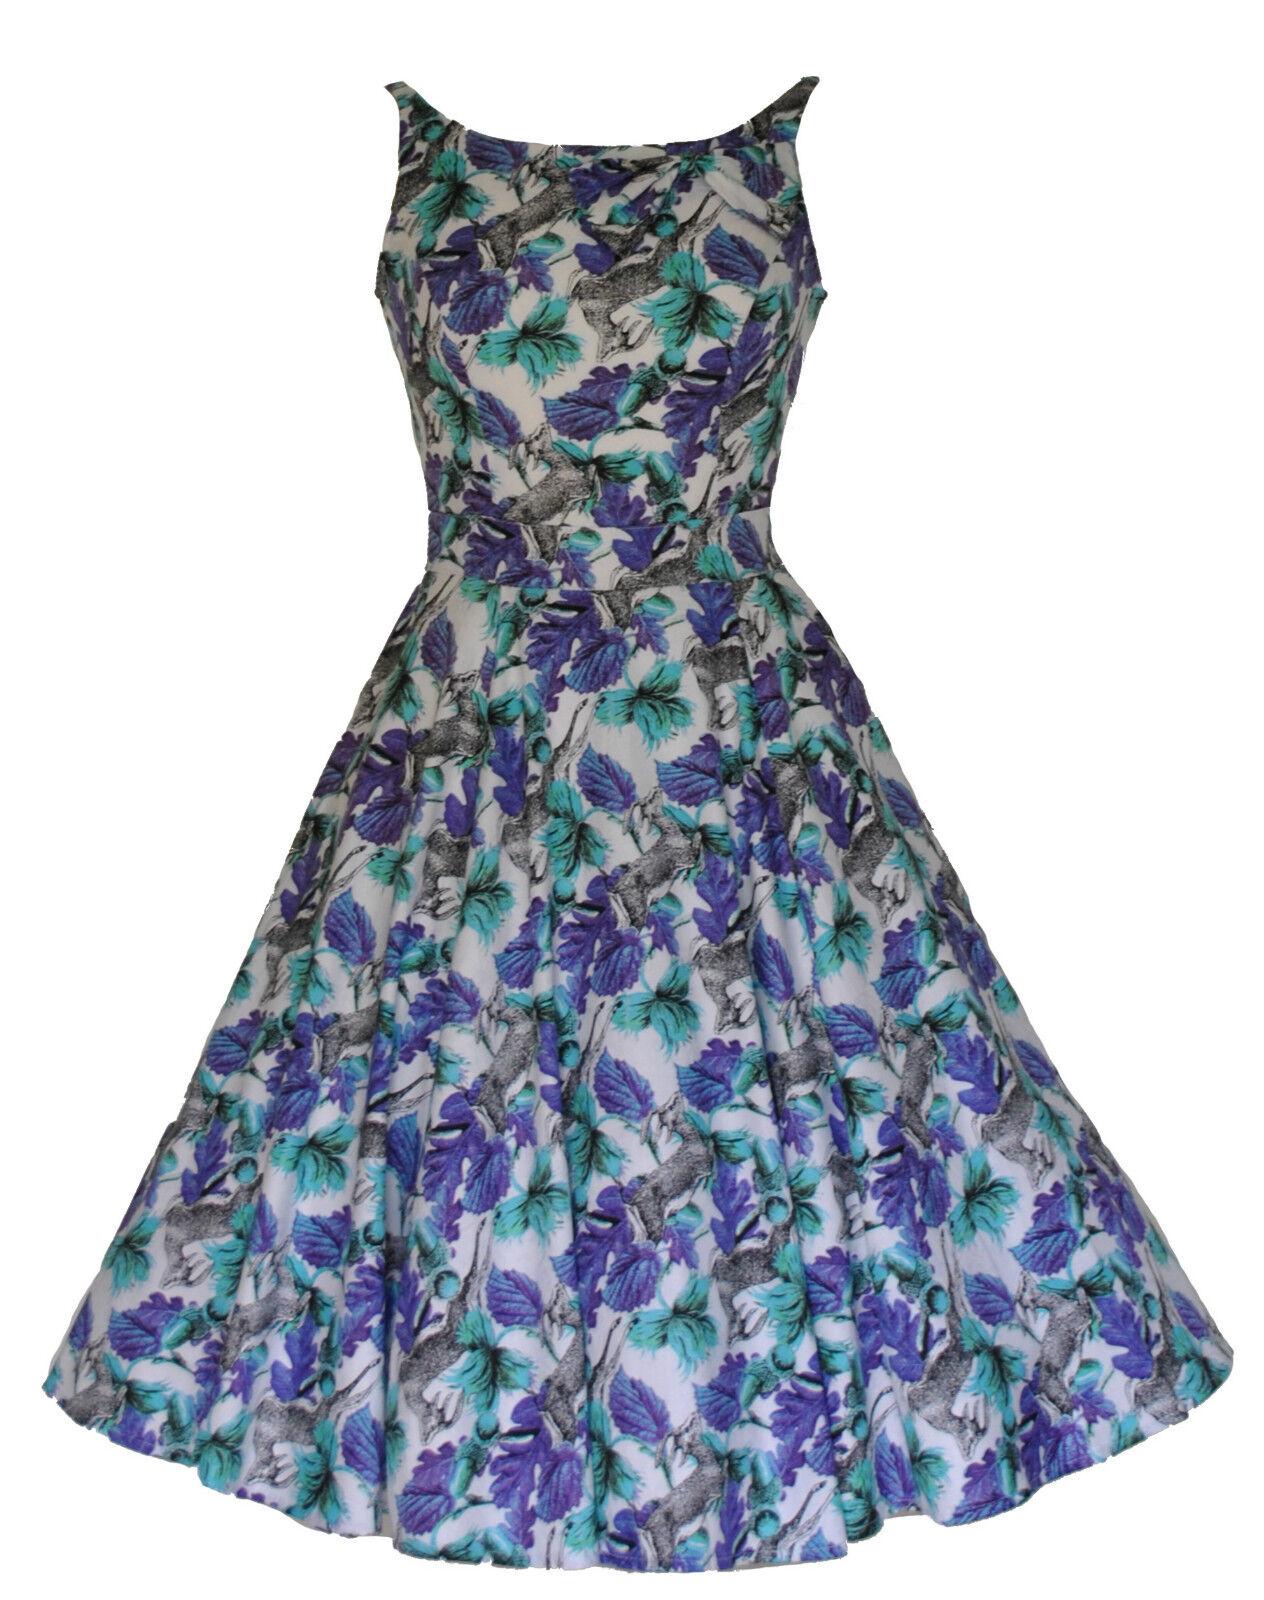 Stile Vintage 40's 40's 40's 50's ANTELOPE & Stampa Floreale Damascata FULL CIRCLE DRESS 8 - 18 ad9d05